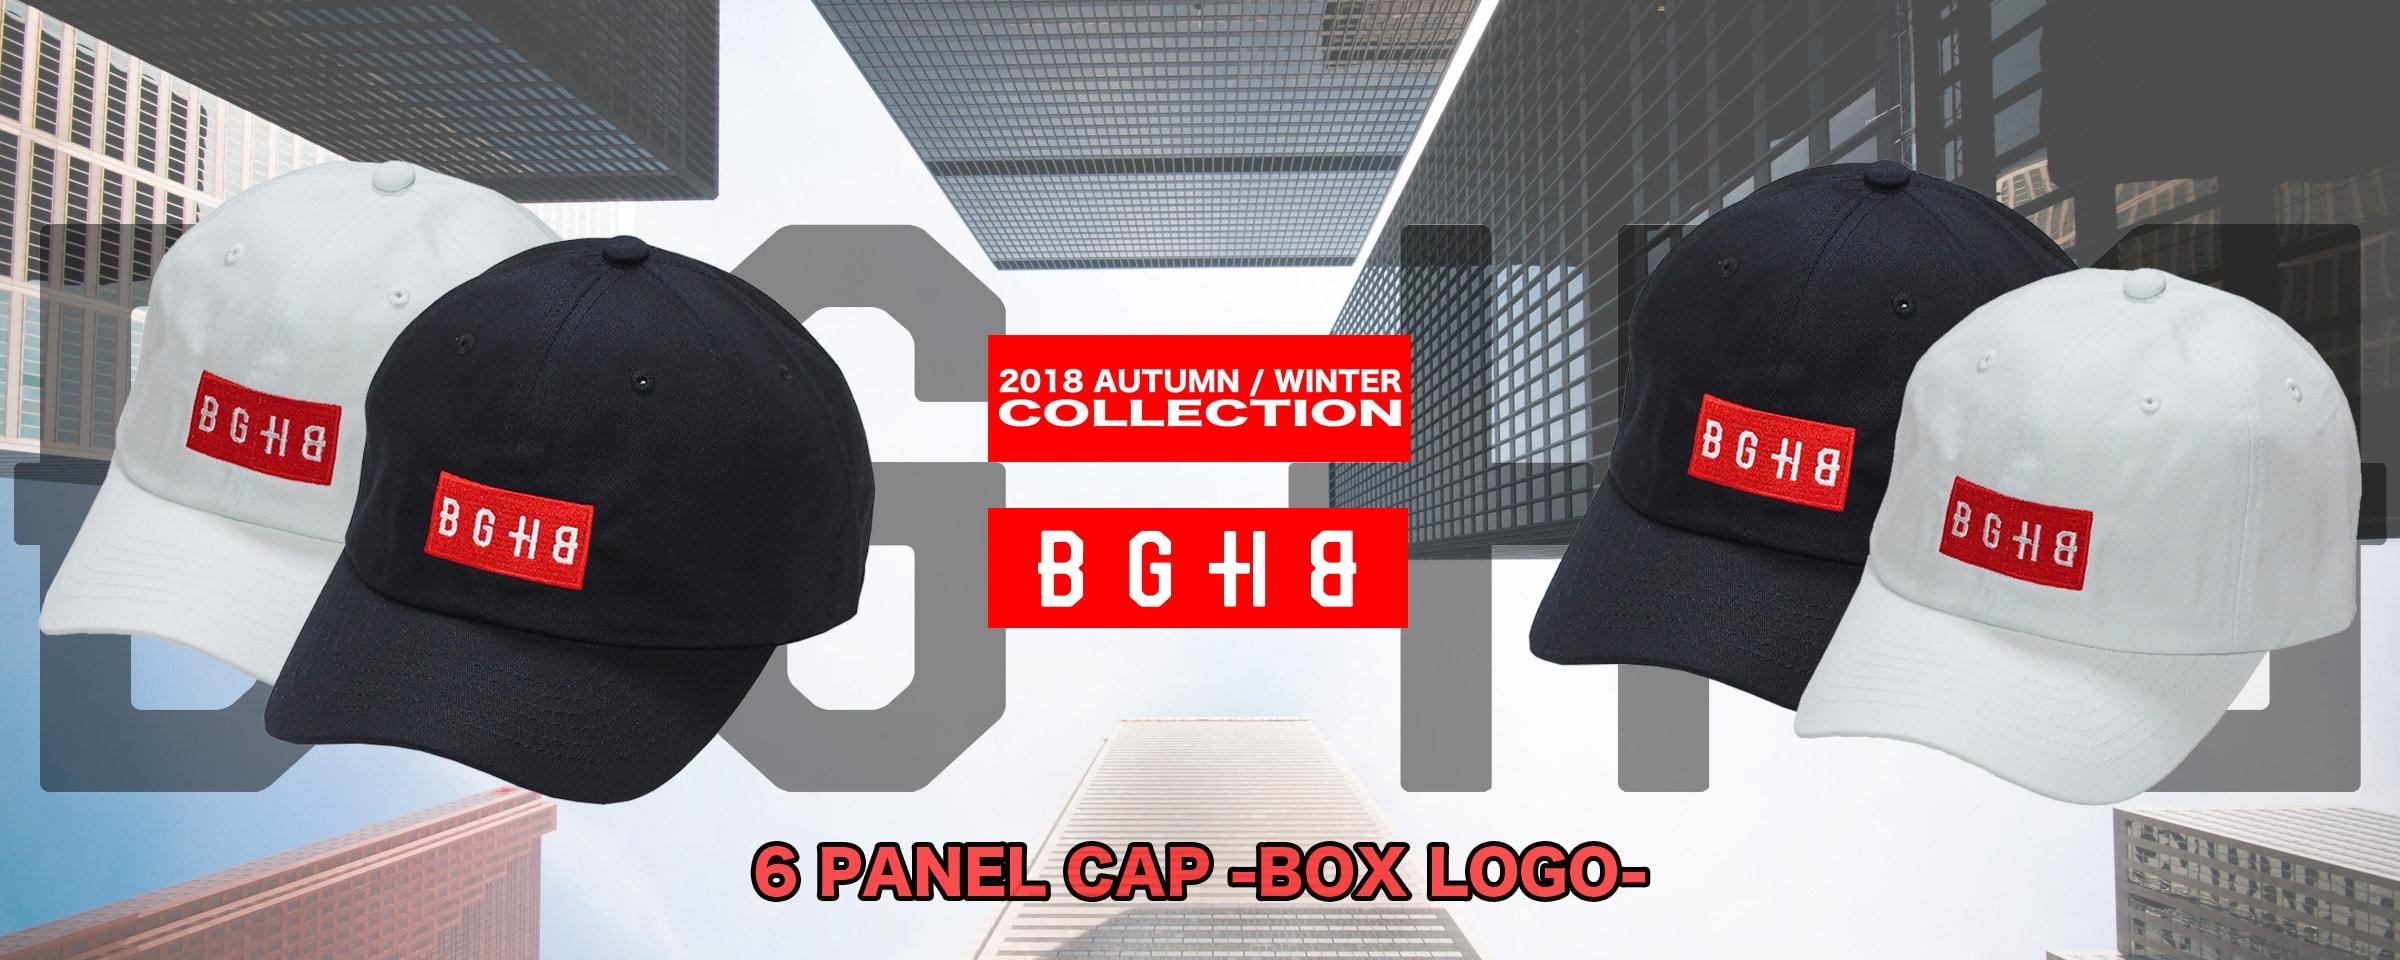 6 PANEL CAP -BOX LOGO-